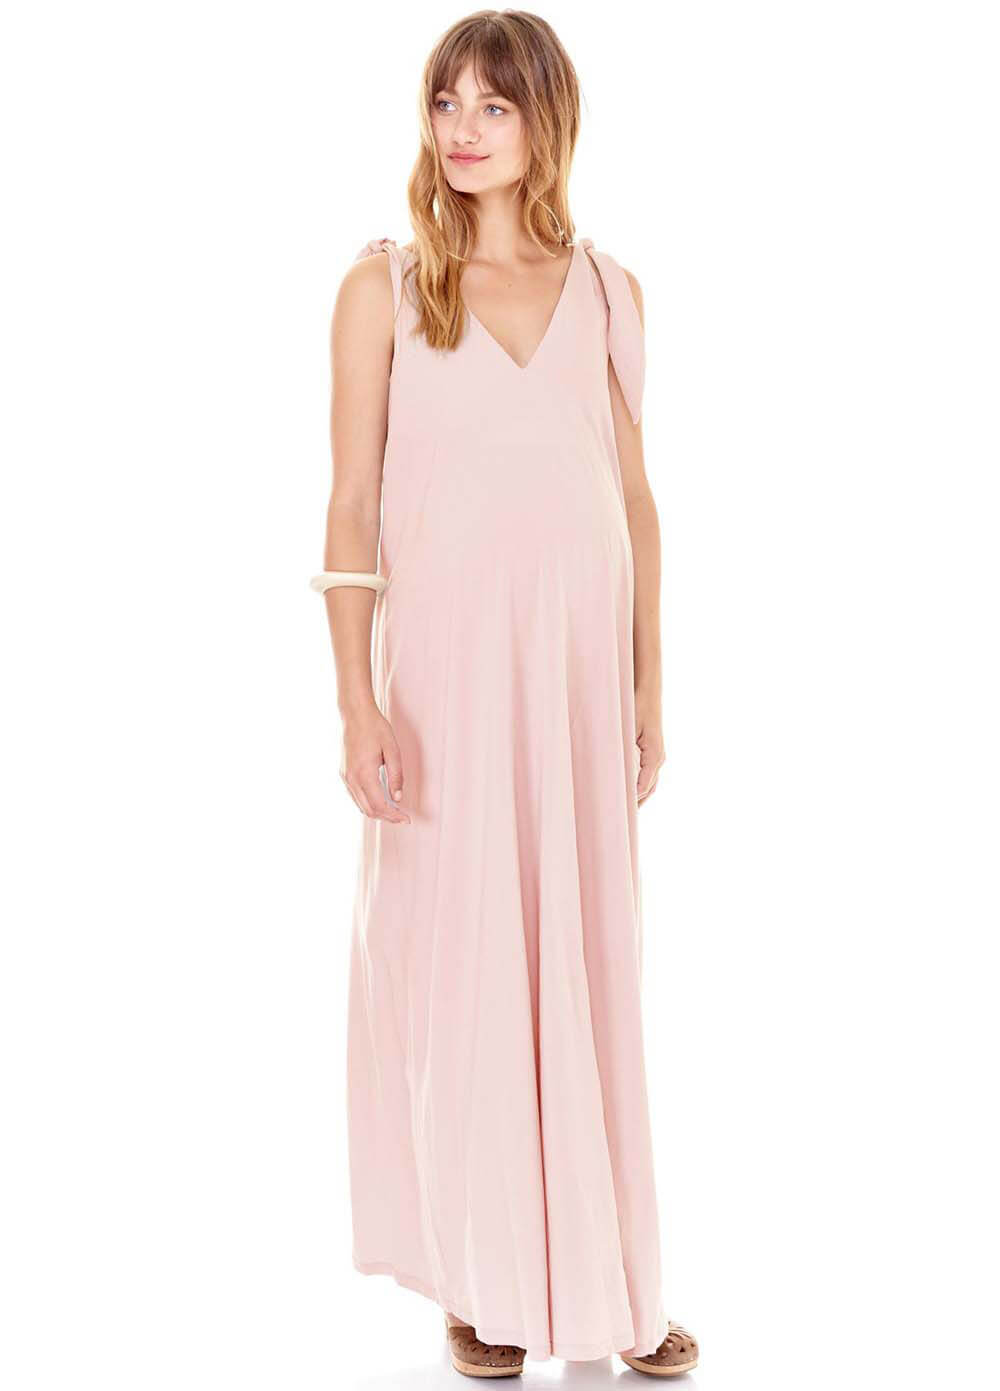 34cc3724331d Jordan Maternity Maxi Dress in Blush by Imanimo